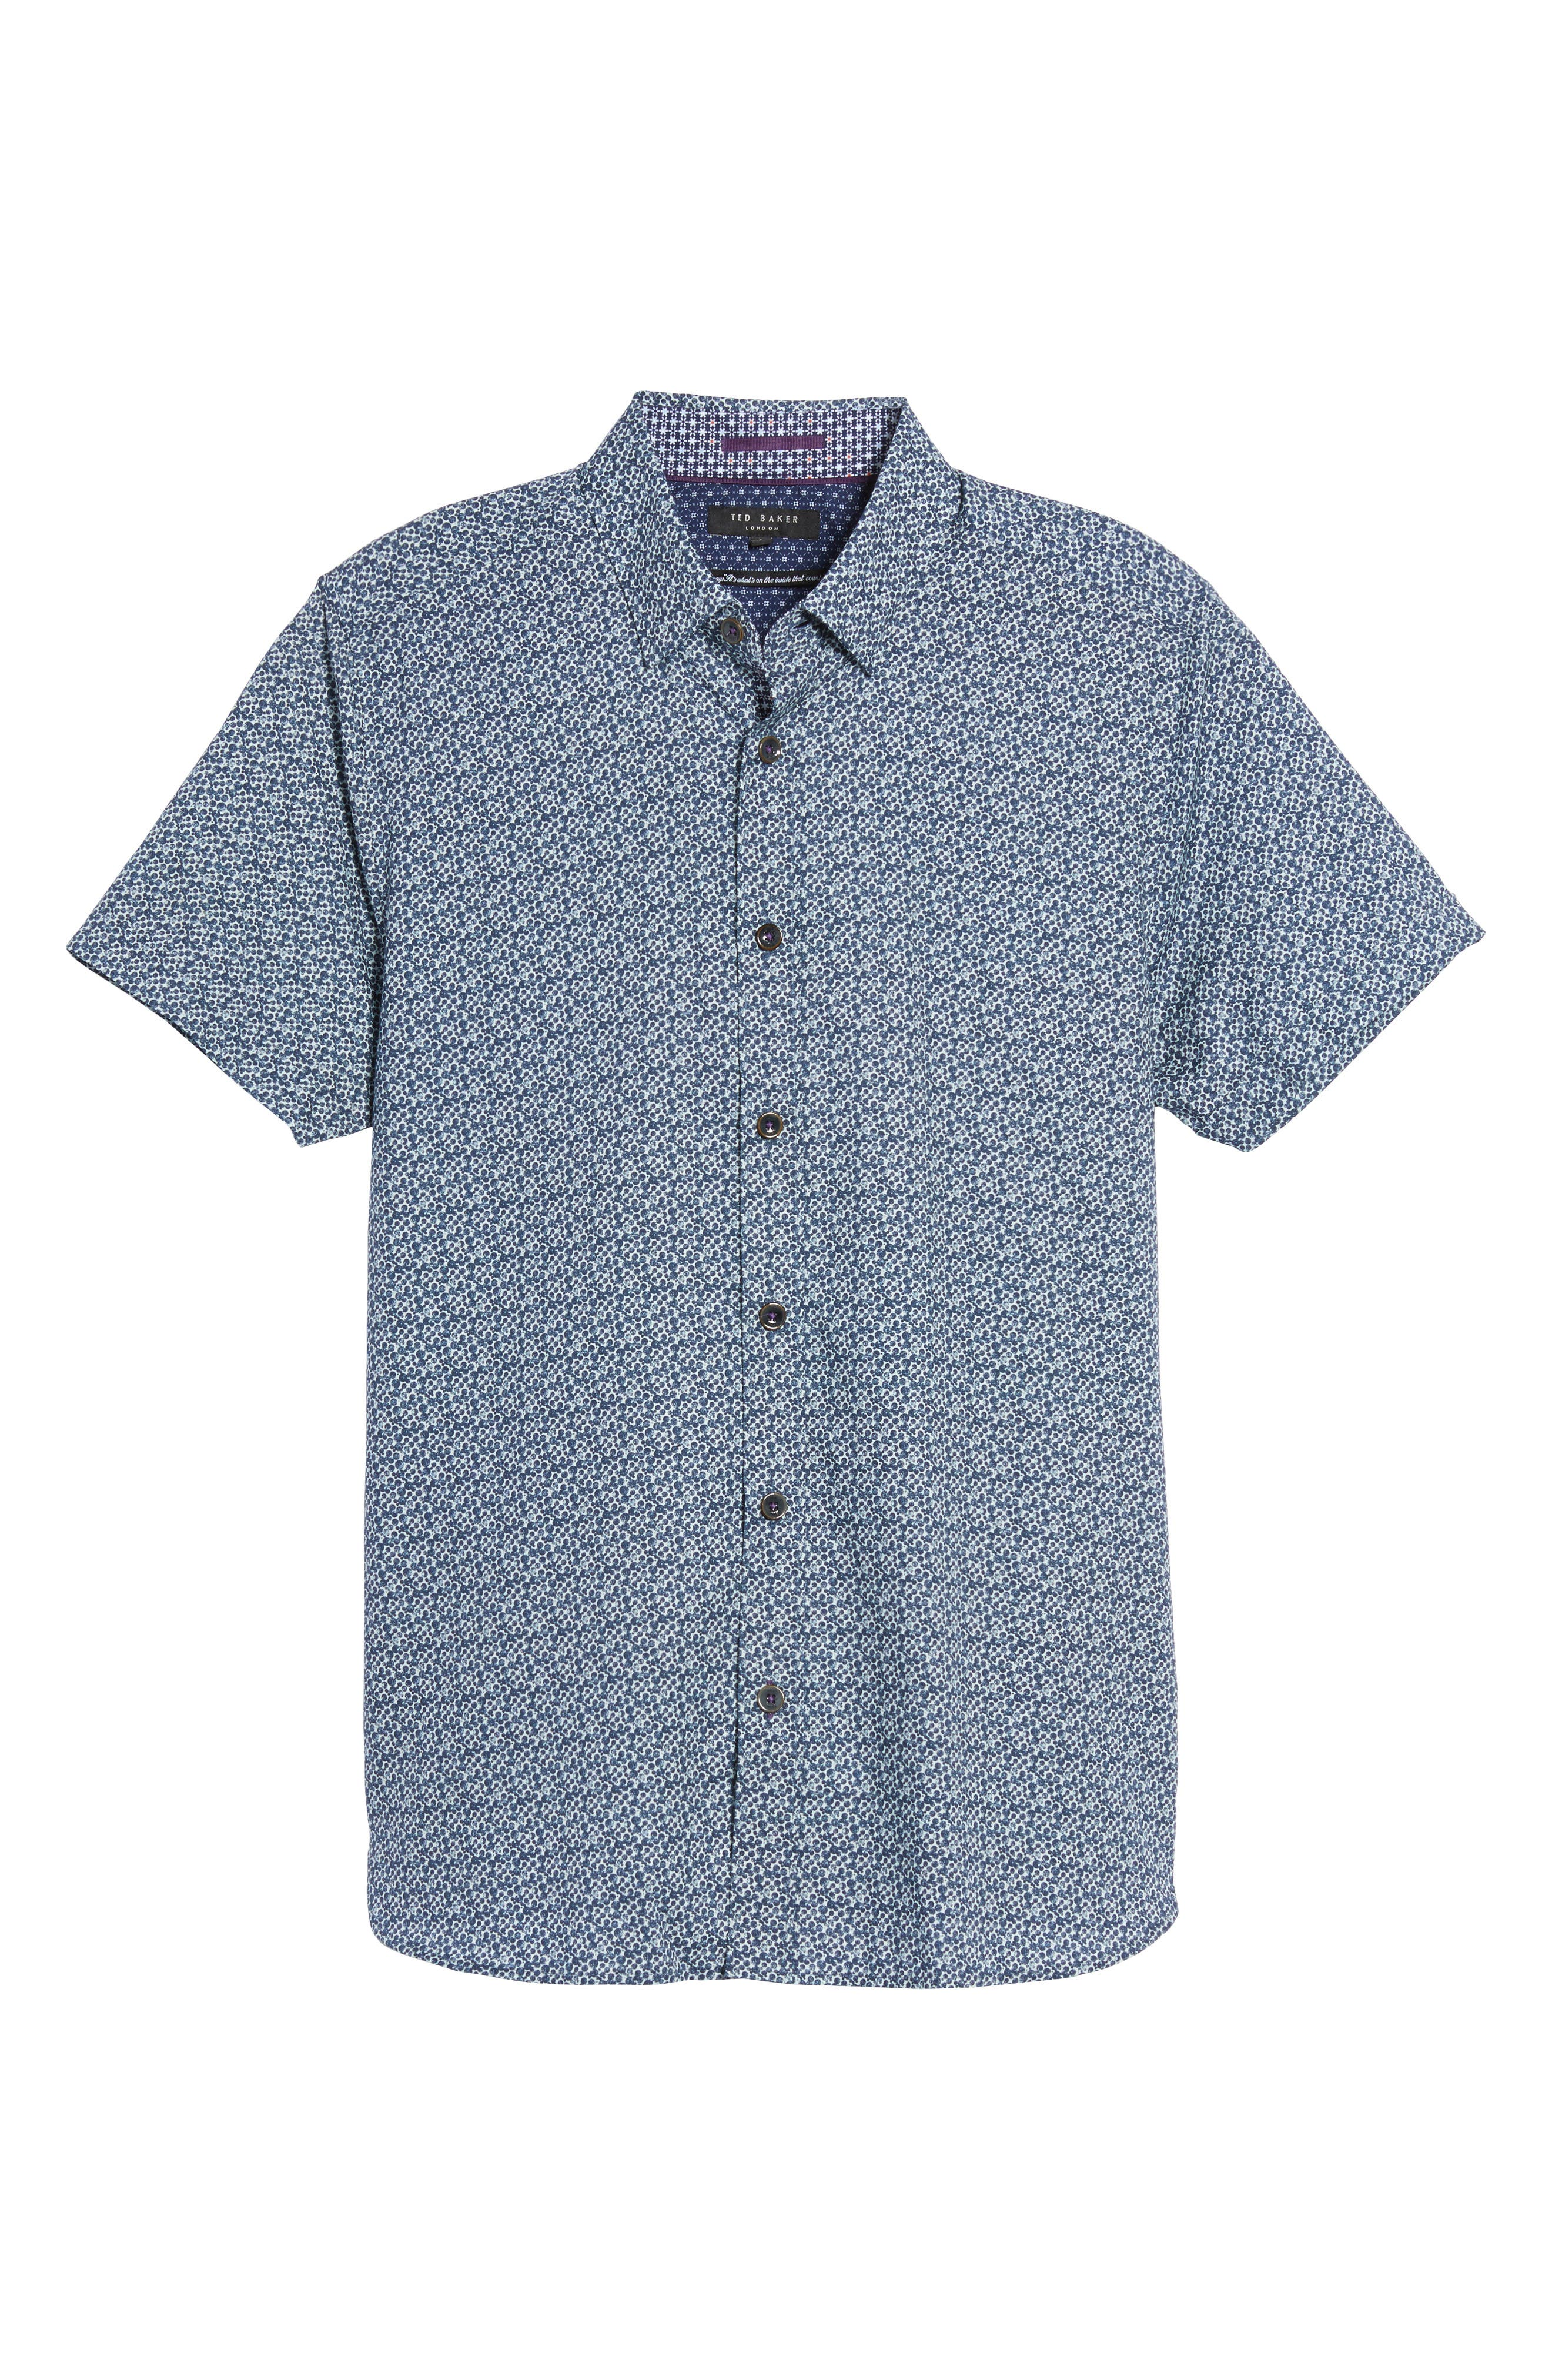 Alternate Image 5  - Ted Baker London Bubbly Extra Slim Fit Print Sport Shirt